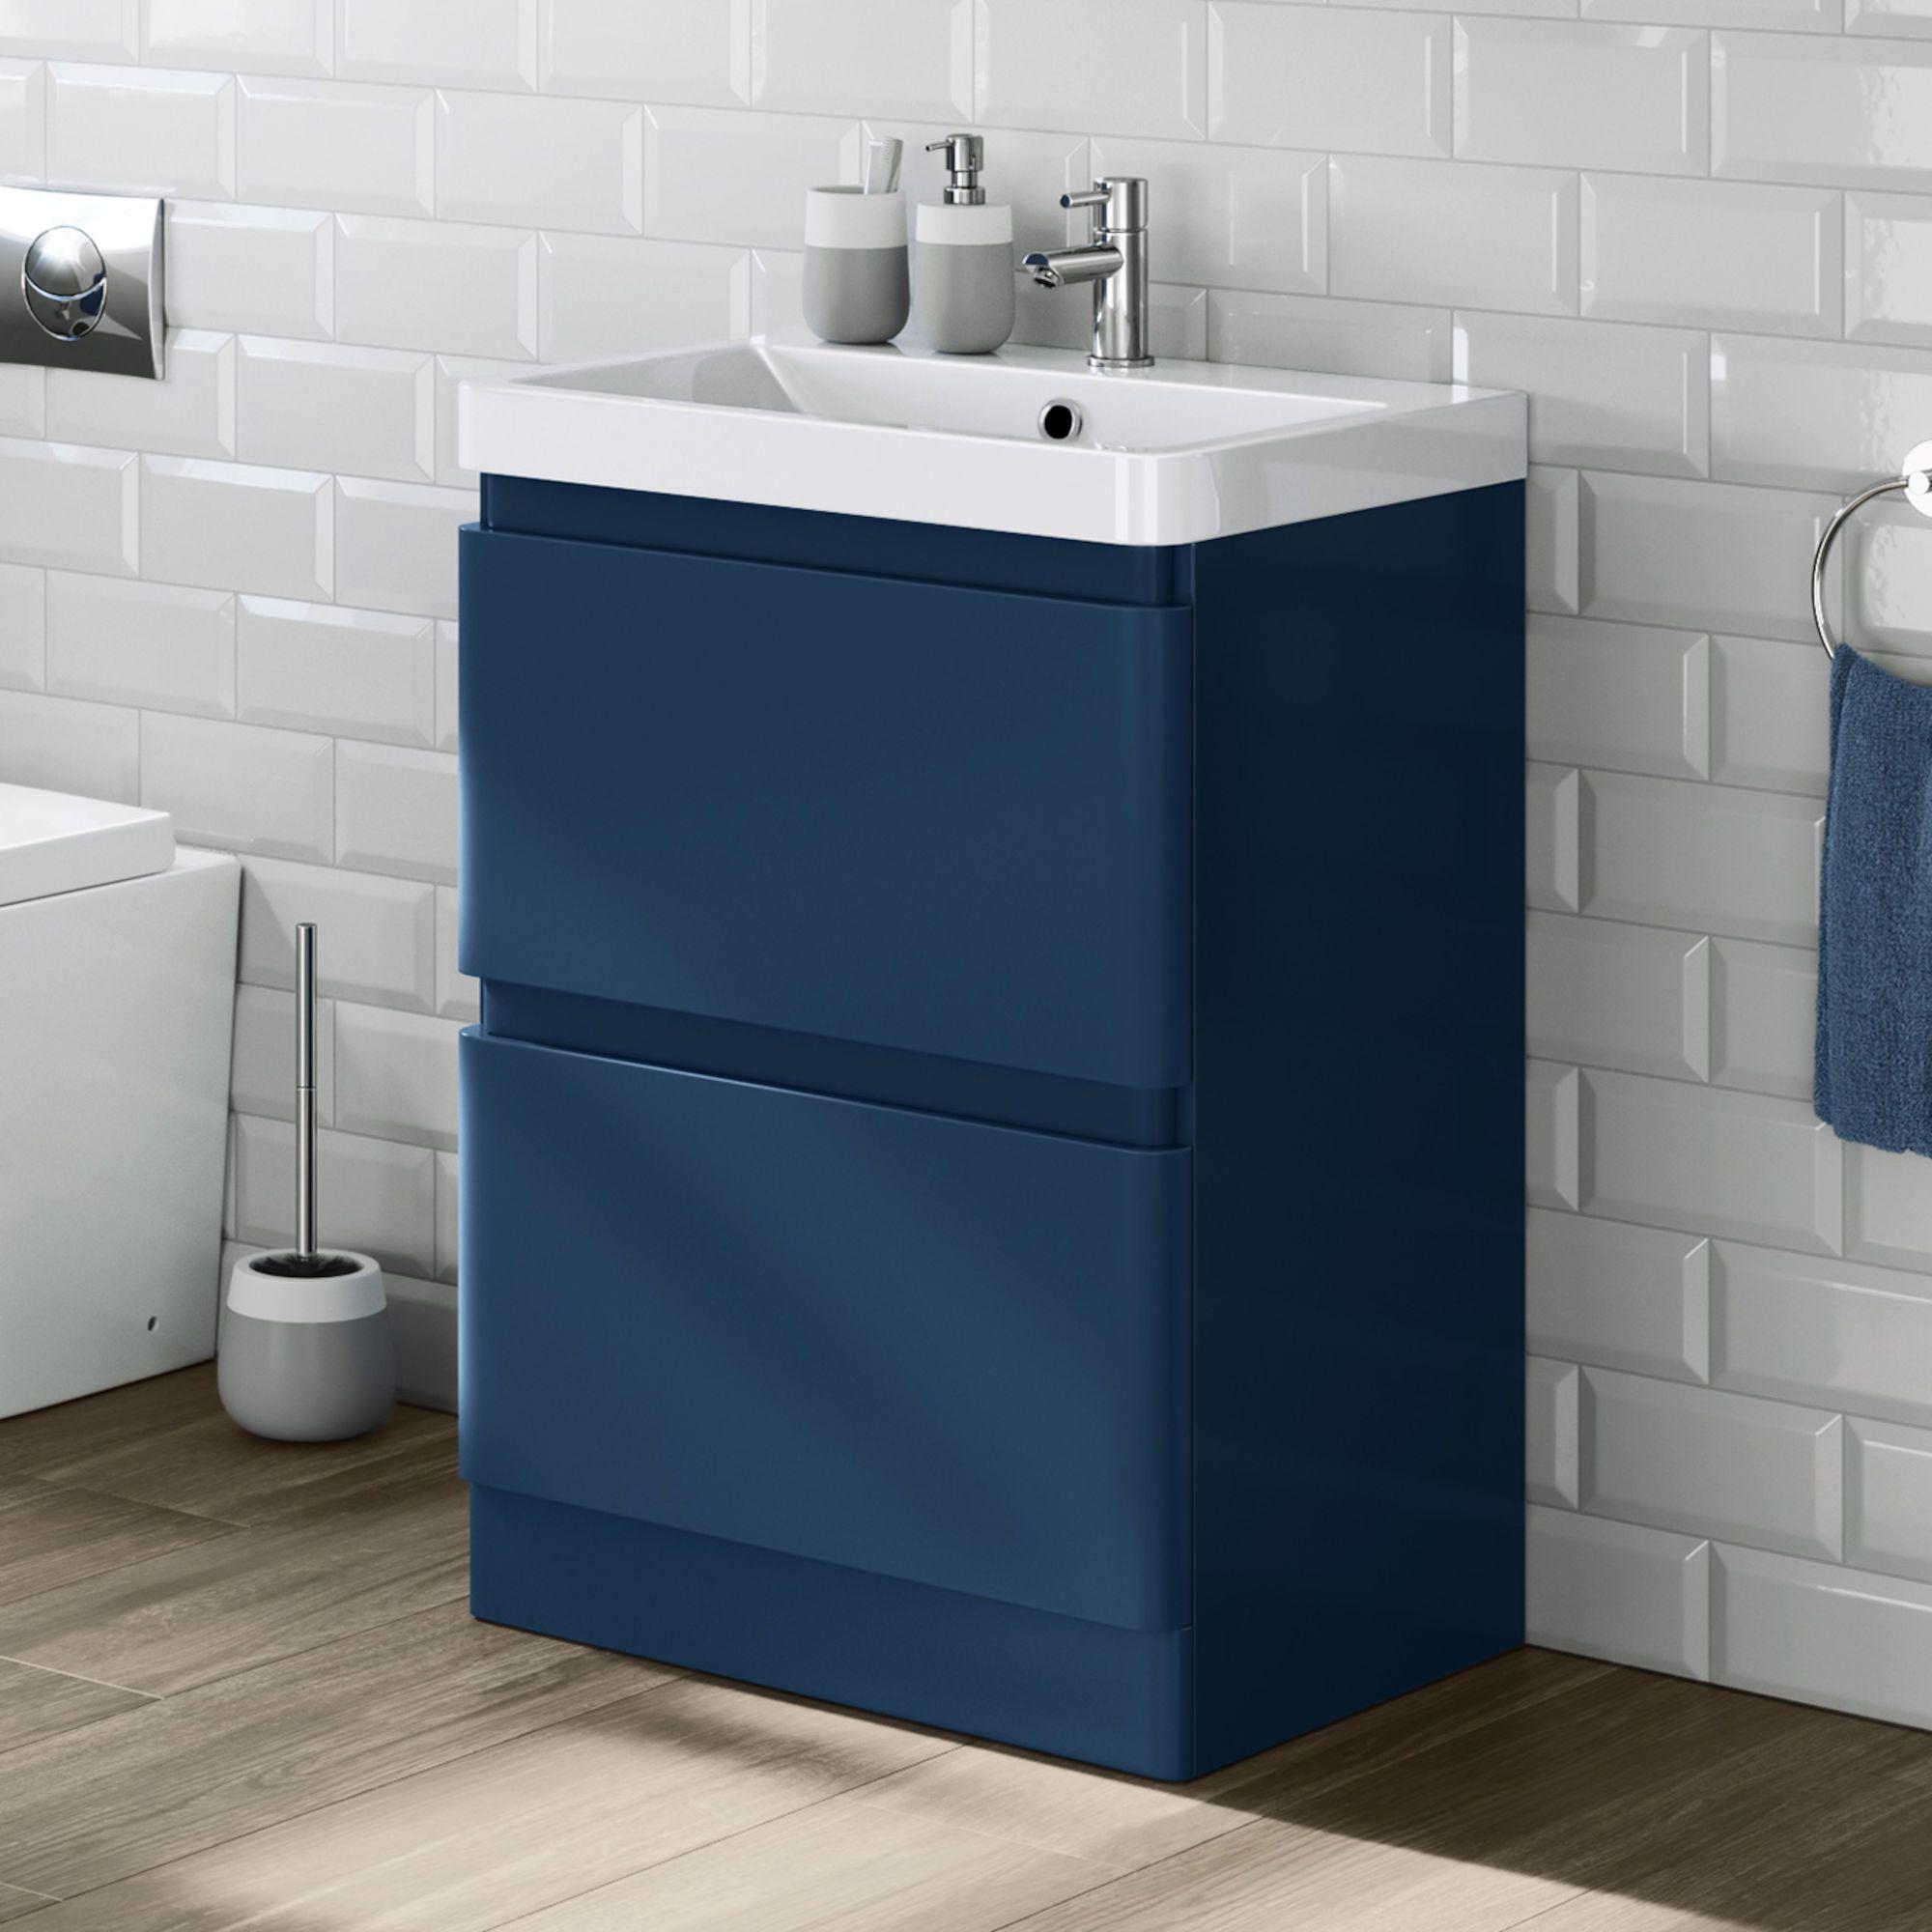 600mm Denver Matte Blue Built In Basin Drawer Unit Floor Standing Soak Com Vanity Units Blue Bathroom Vanity Blue Vanity